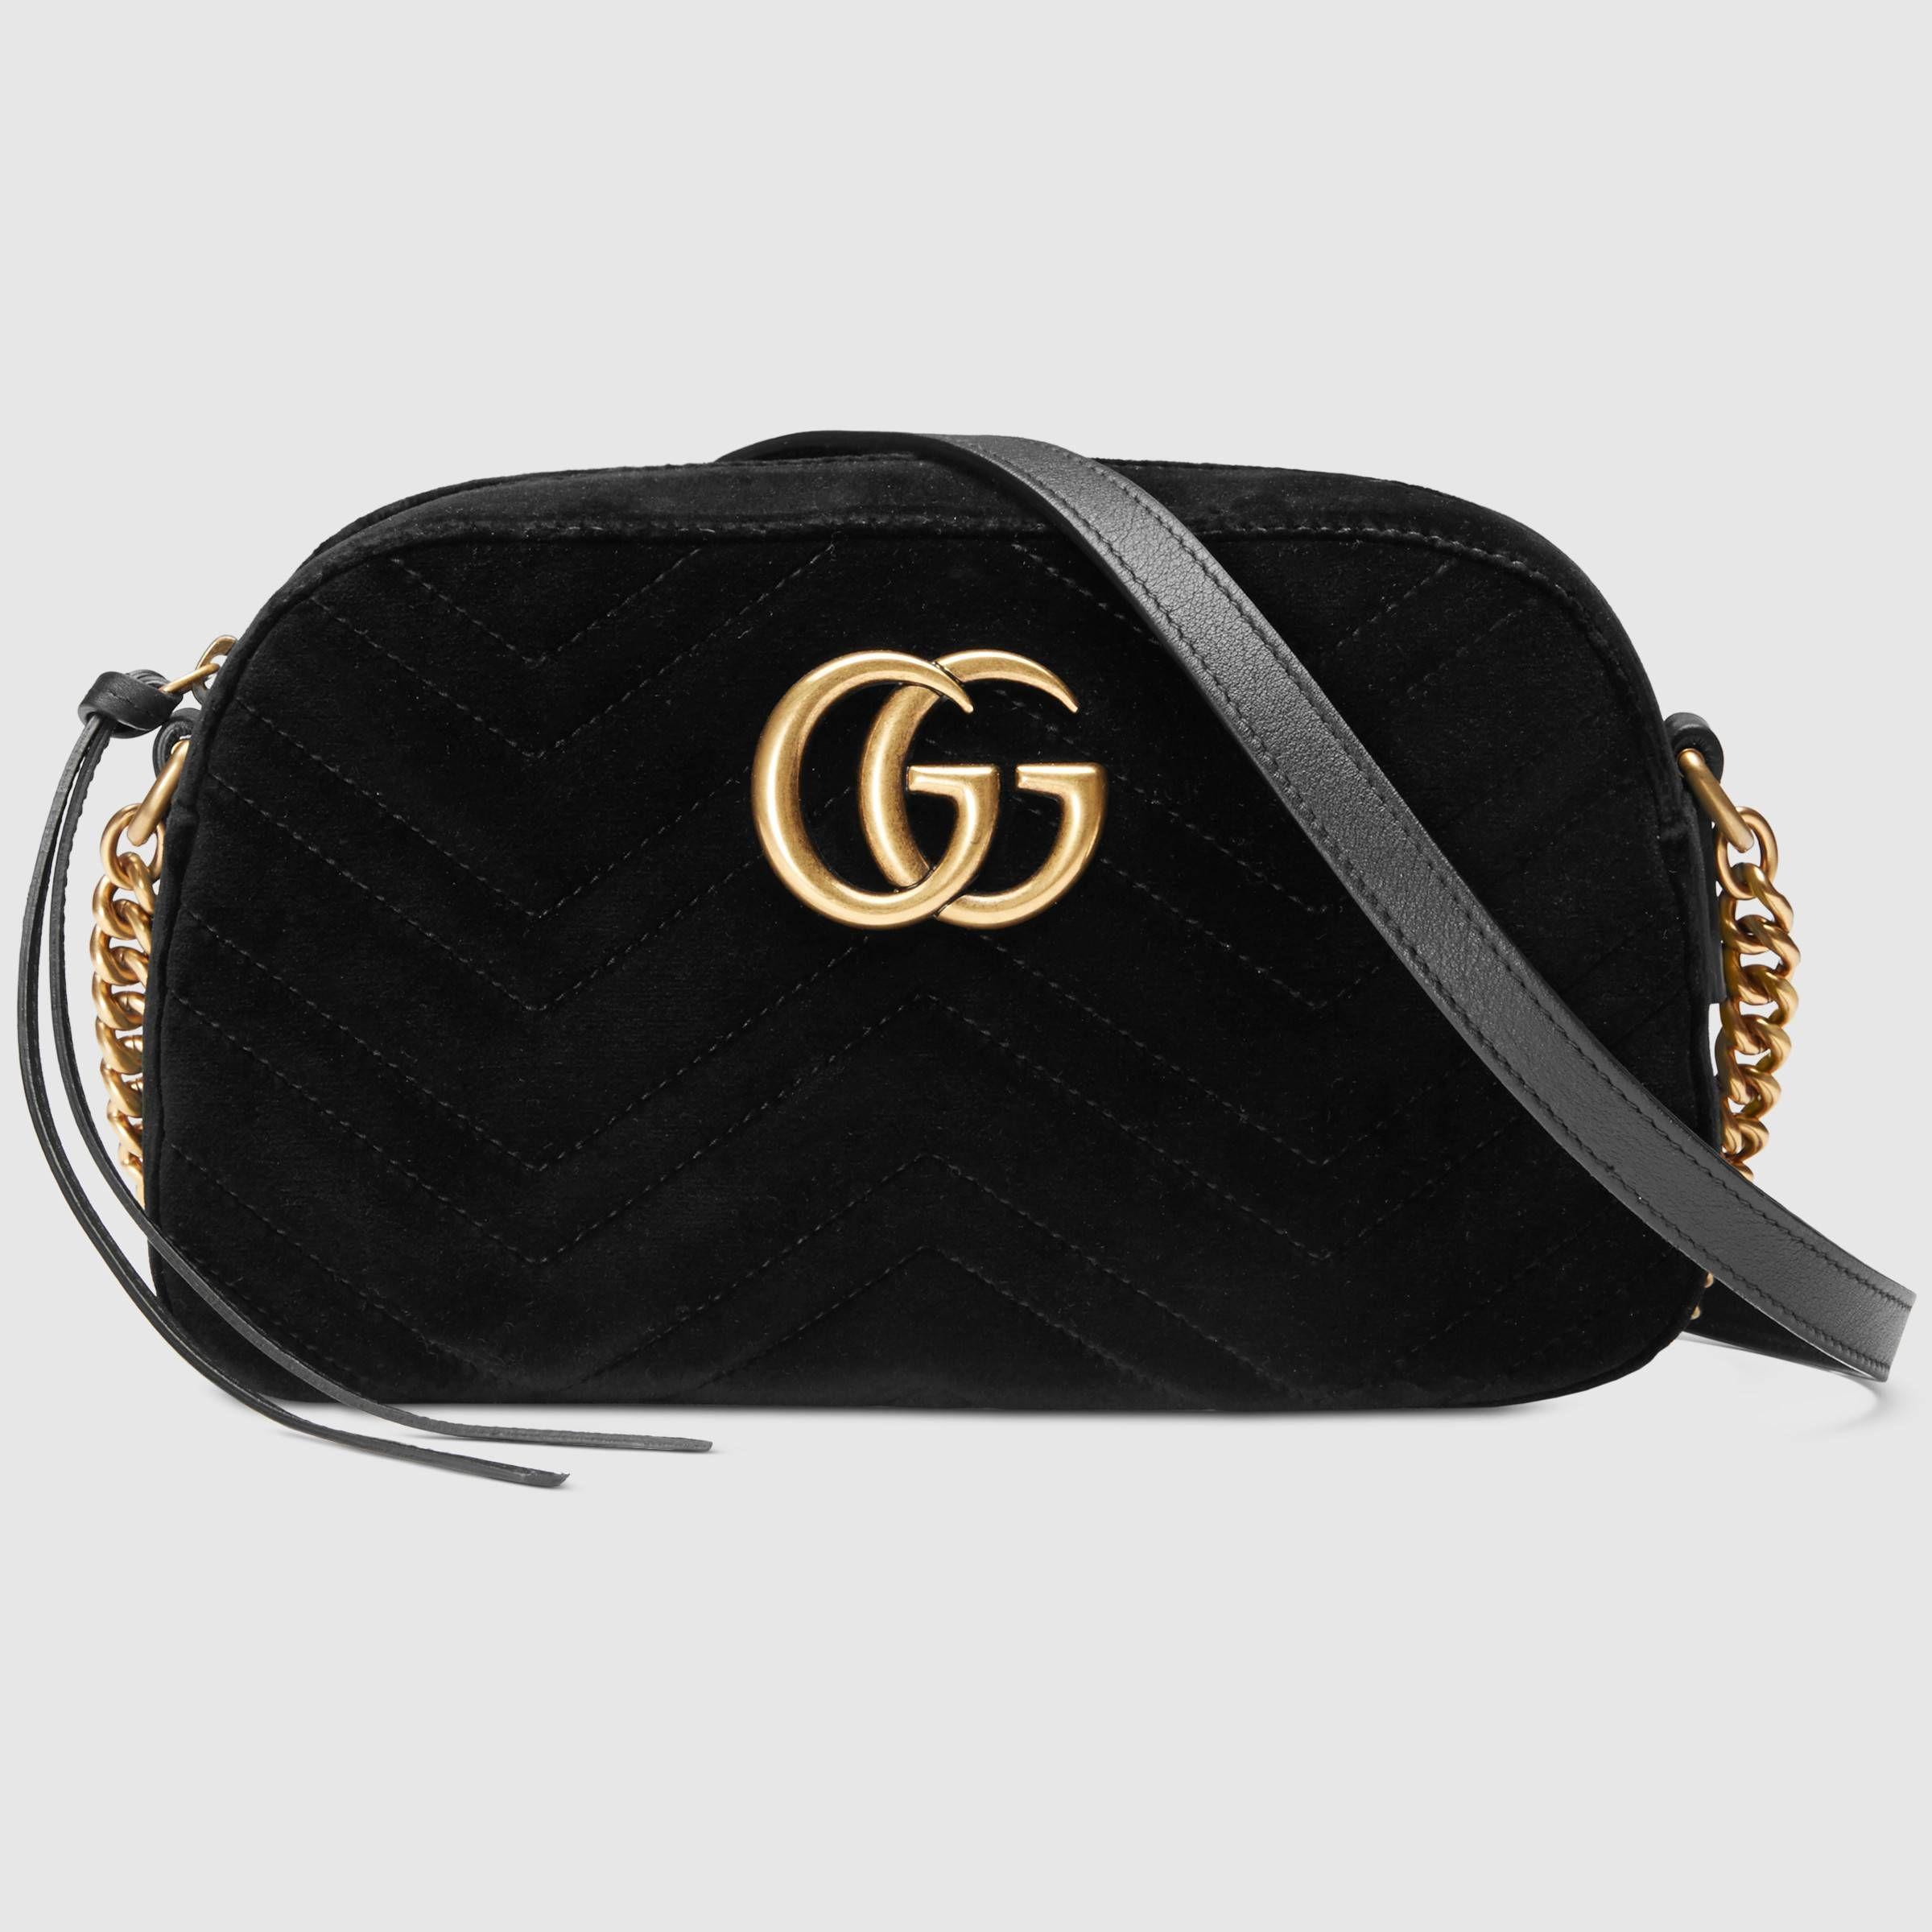 66fe099c926 GG Marmont velvet small shoulder bag - Gucci Women s Shoulder Bags  4476329QIBT1000